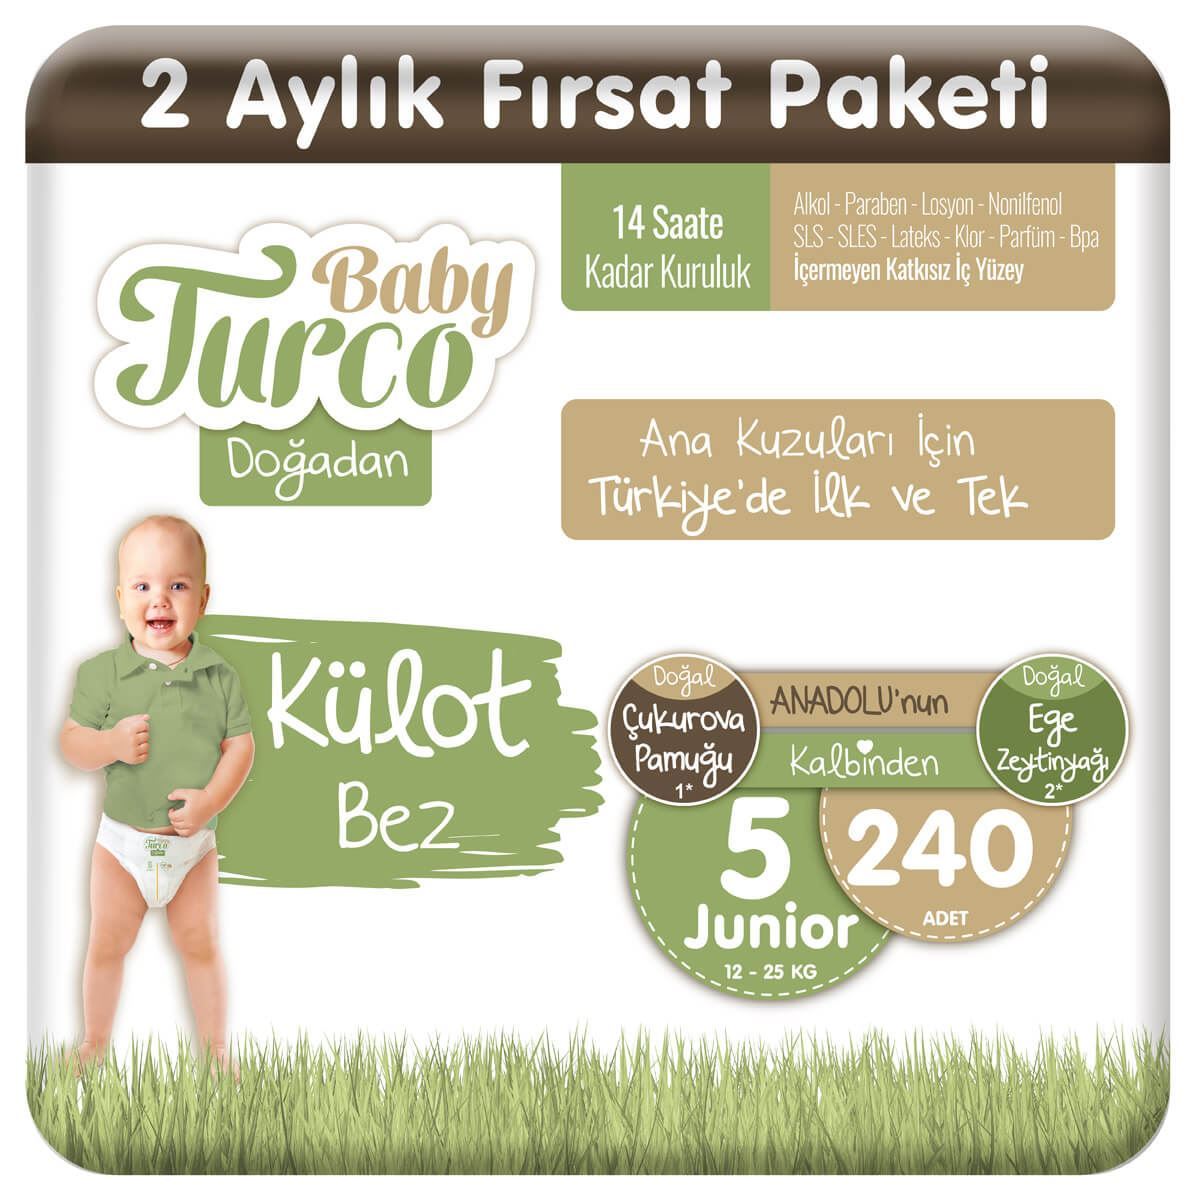 Baby Turco Doğadan Külot Bez 5 Numara Junıor 240 Adet